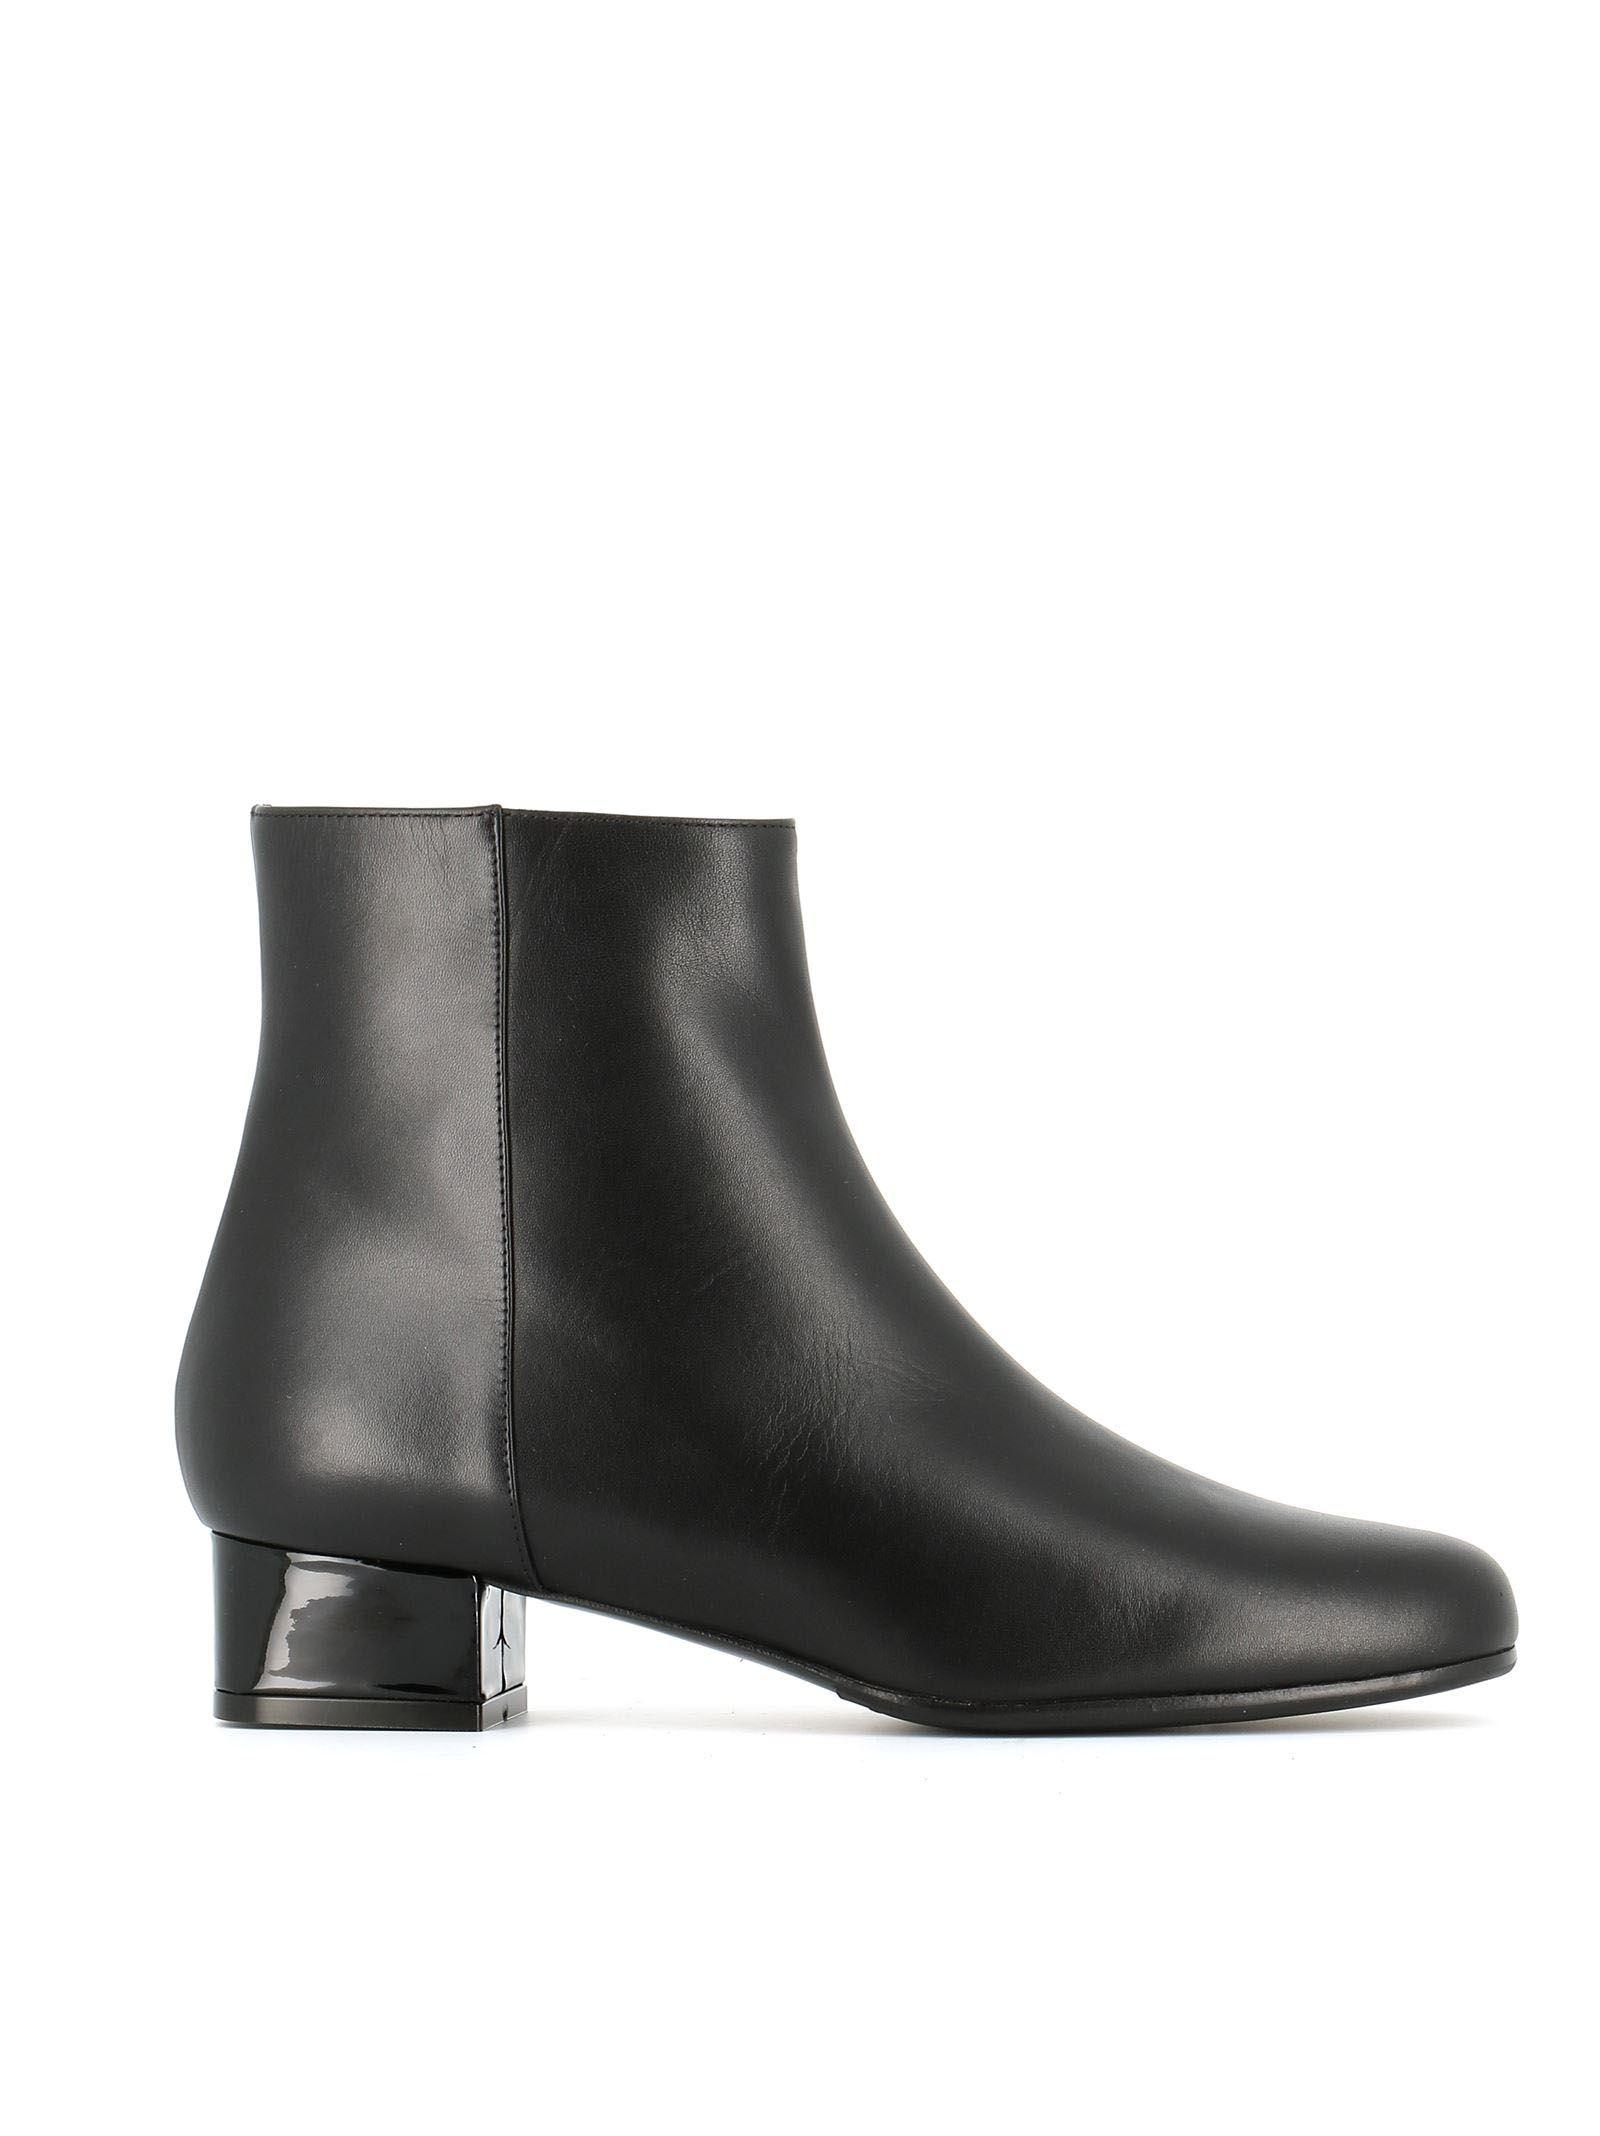 Antonio Barbato Ab6403 Ankle Boots In Black